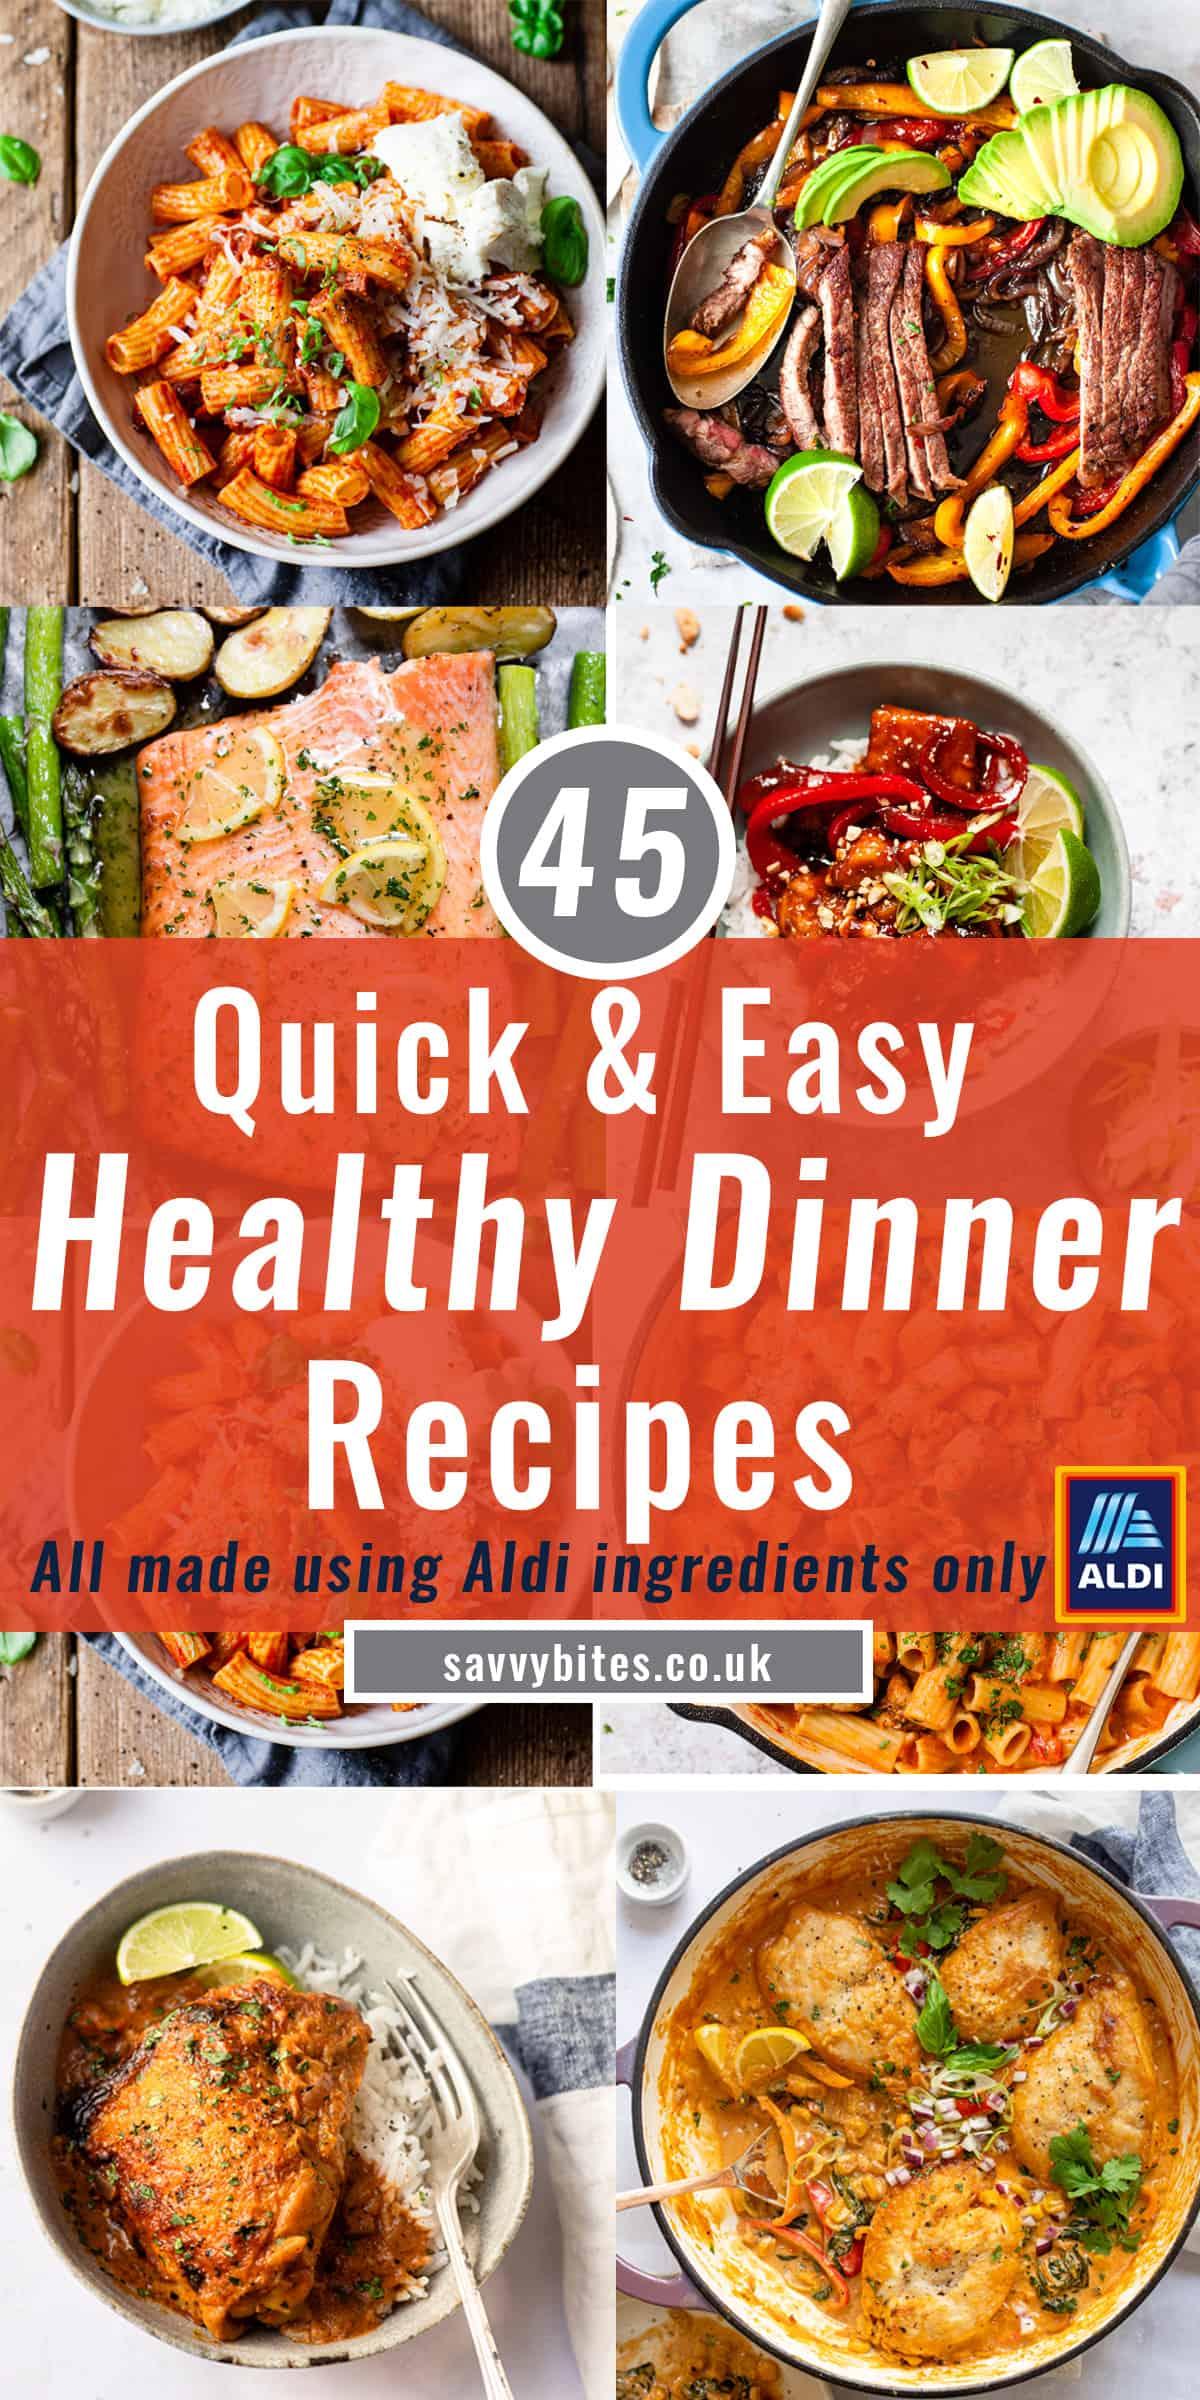 45 healthy dinners photos with text overlay.